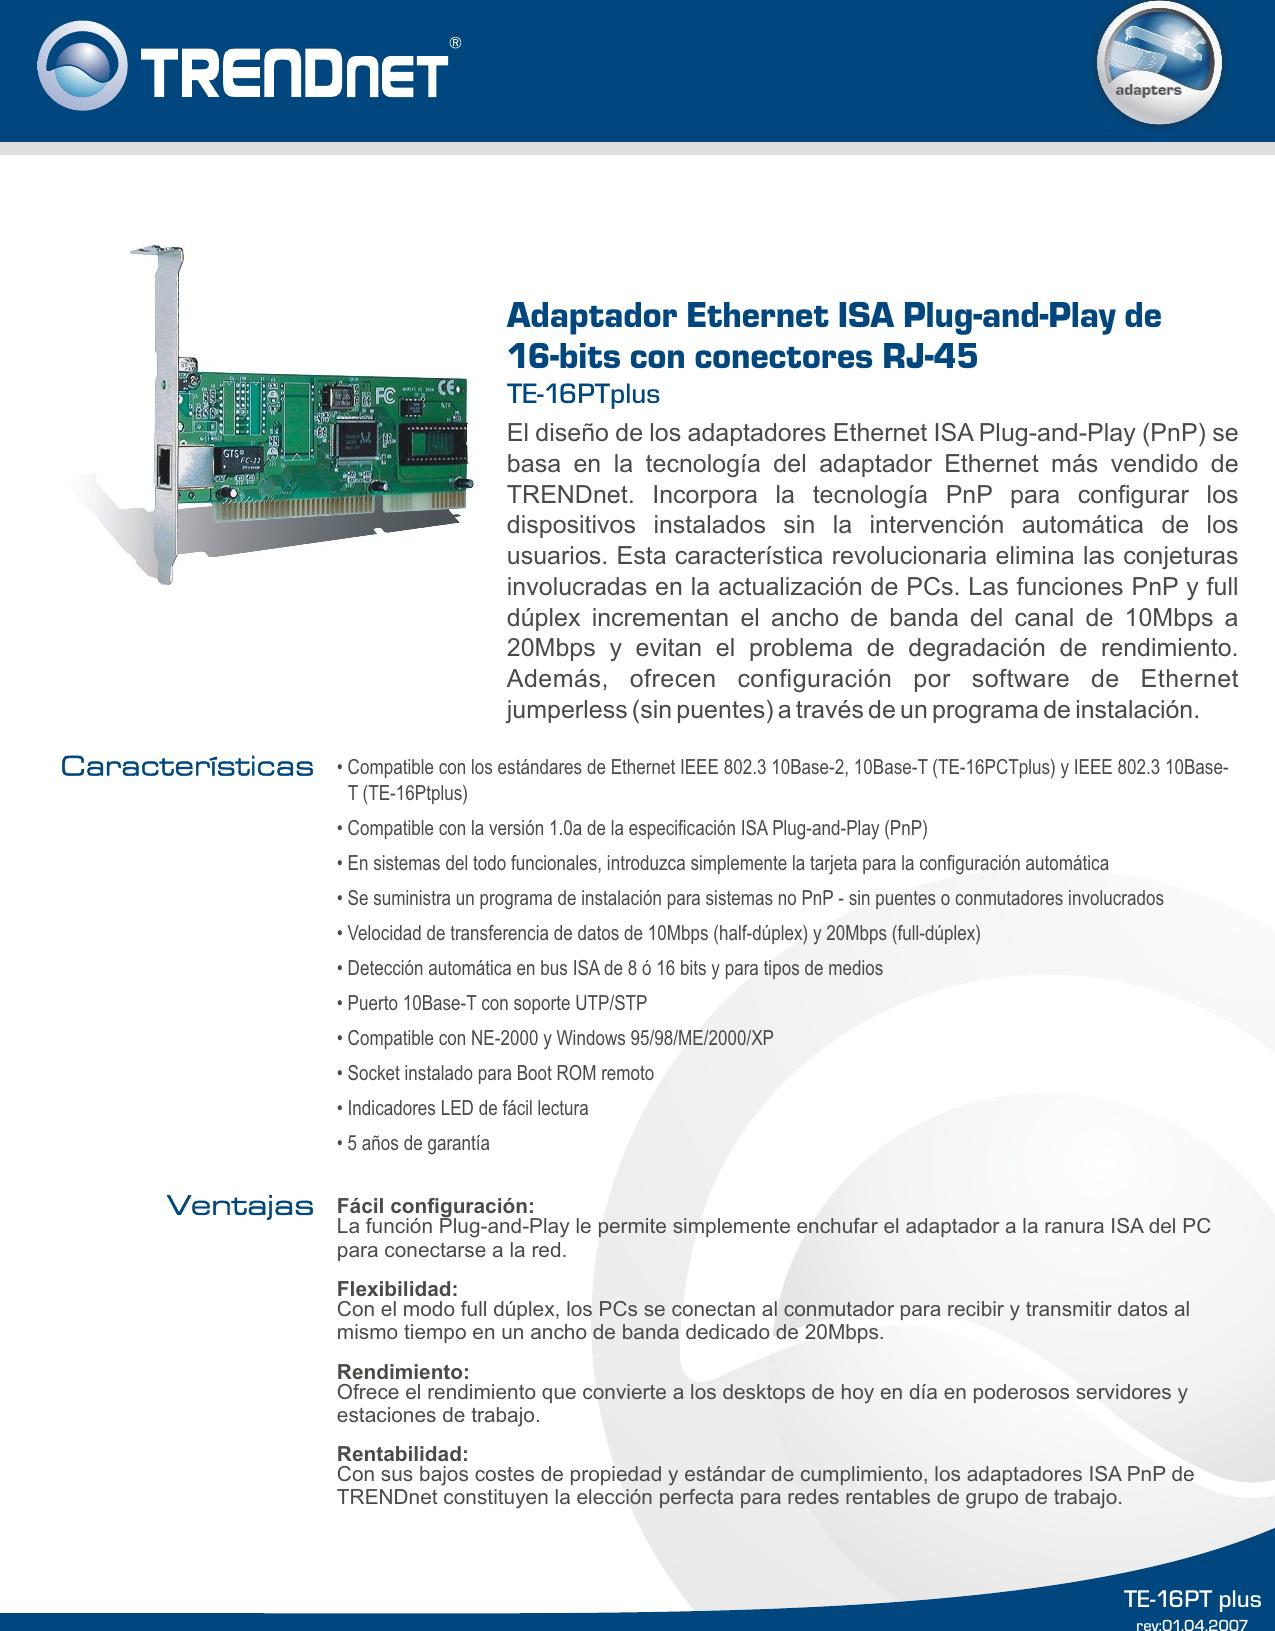 TRENDNET TE-16PCTPLUS NETWORK ADAPTER DRIVERS WINDOWS 7 (2019)